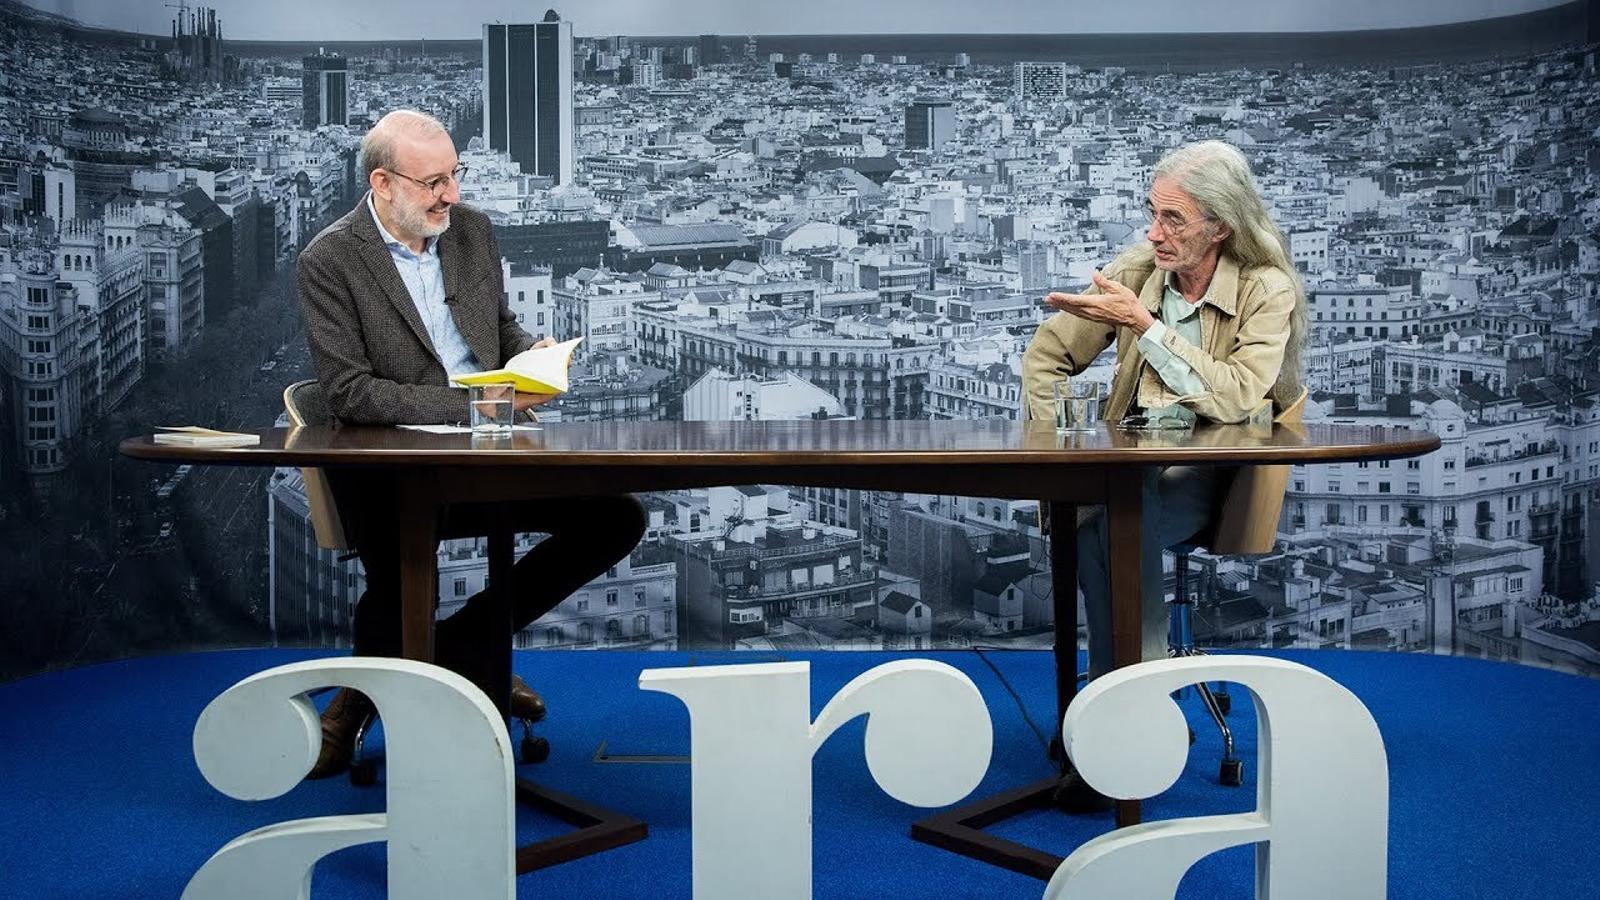 Entrevista d'Antoni Bassas a Enric Casasses